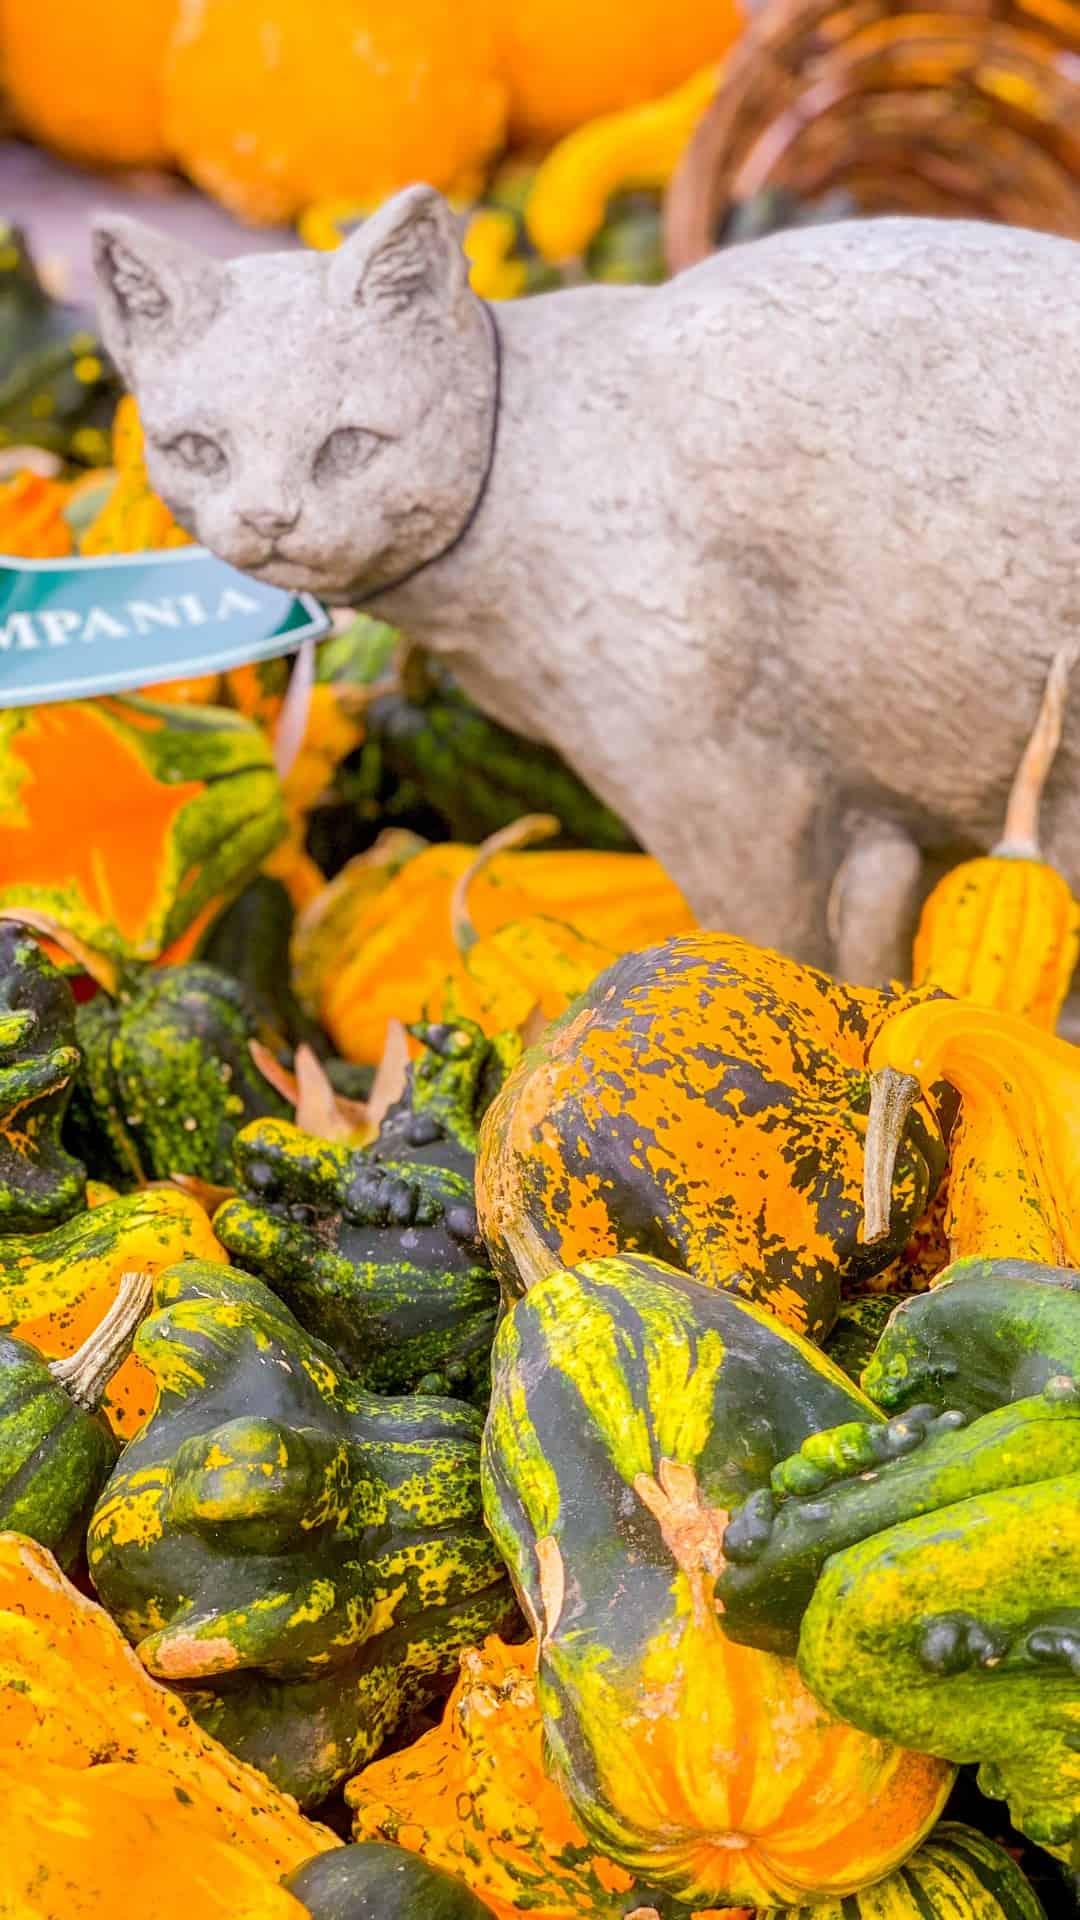 Autumn Wallpaper iPhone Aesthetic Halloween Cats